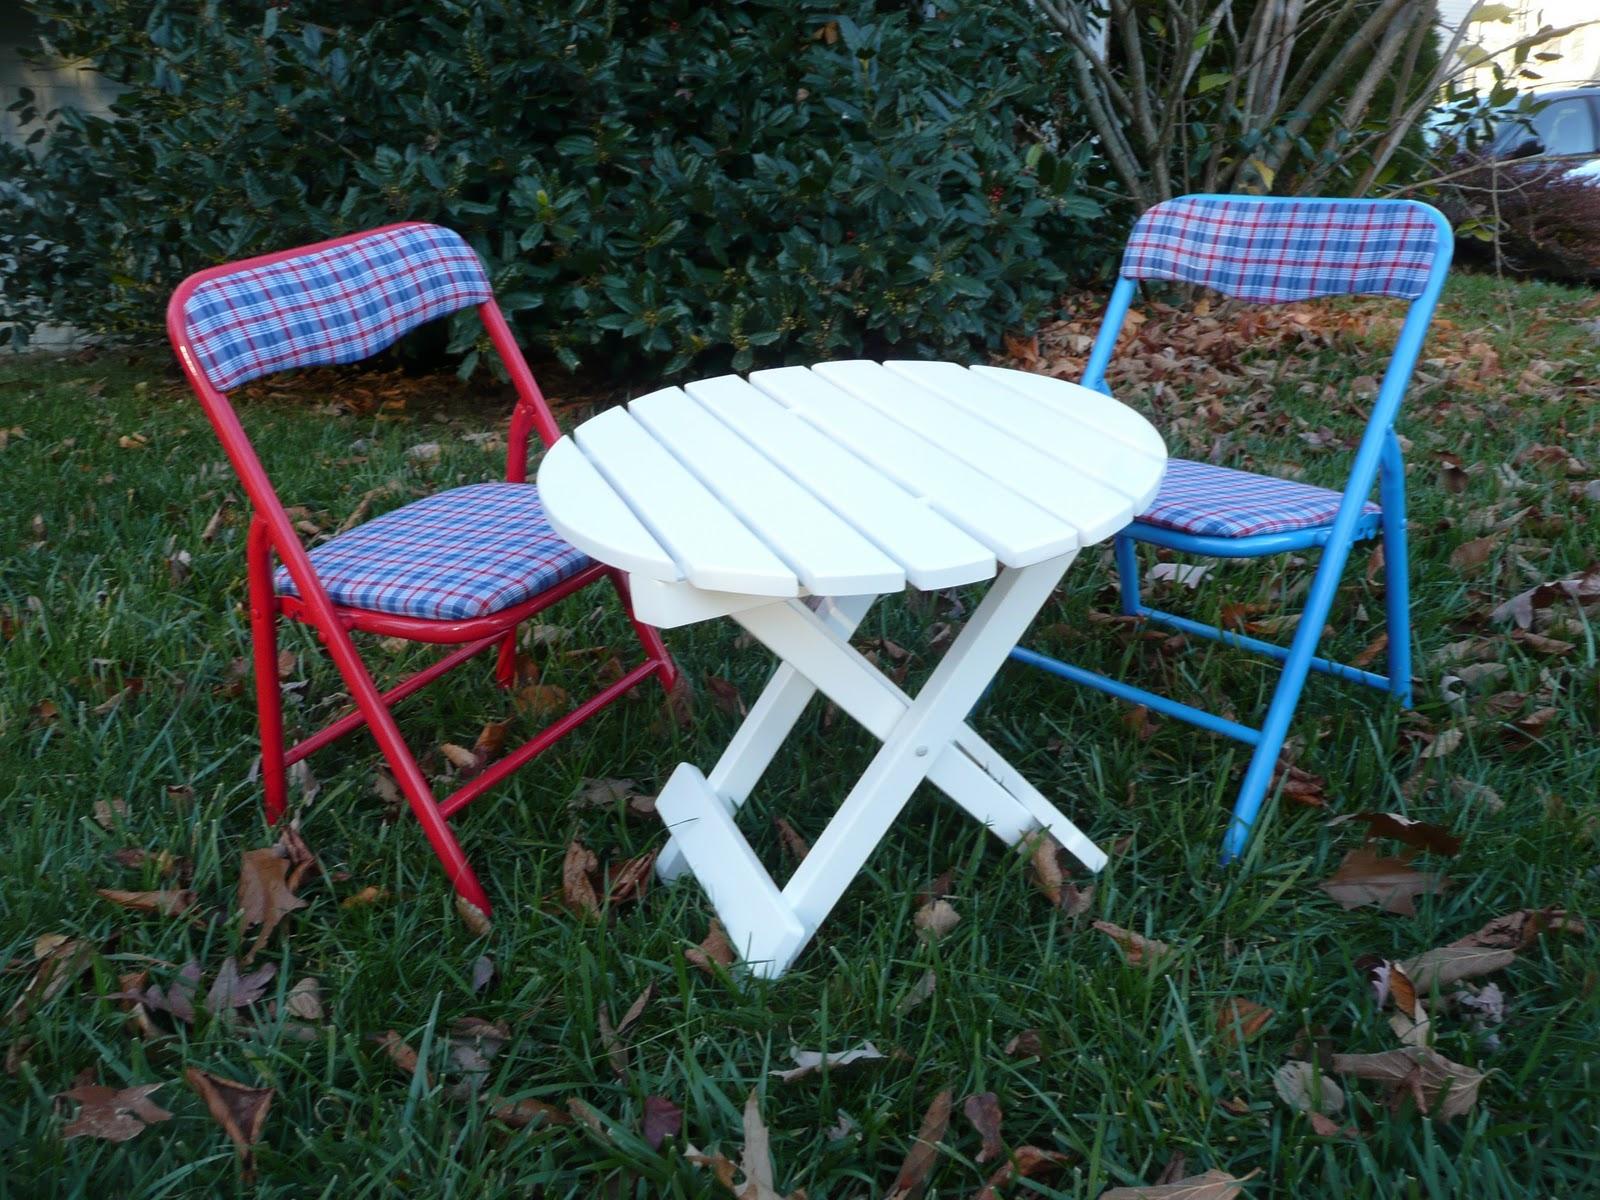 Sensational The Craft Tutor Reupholster Childrens Folding Chairs Machost Co Dining Chair Design Ideas Machostcouk